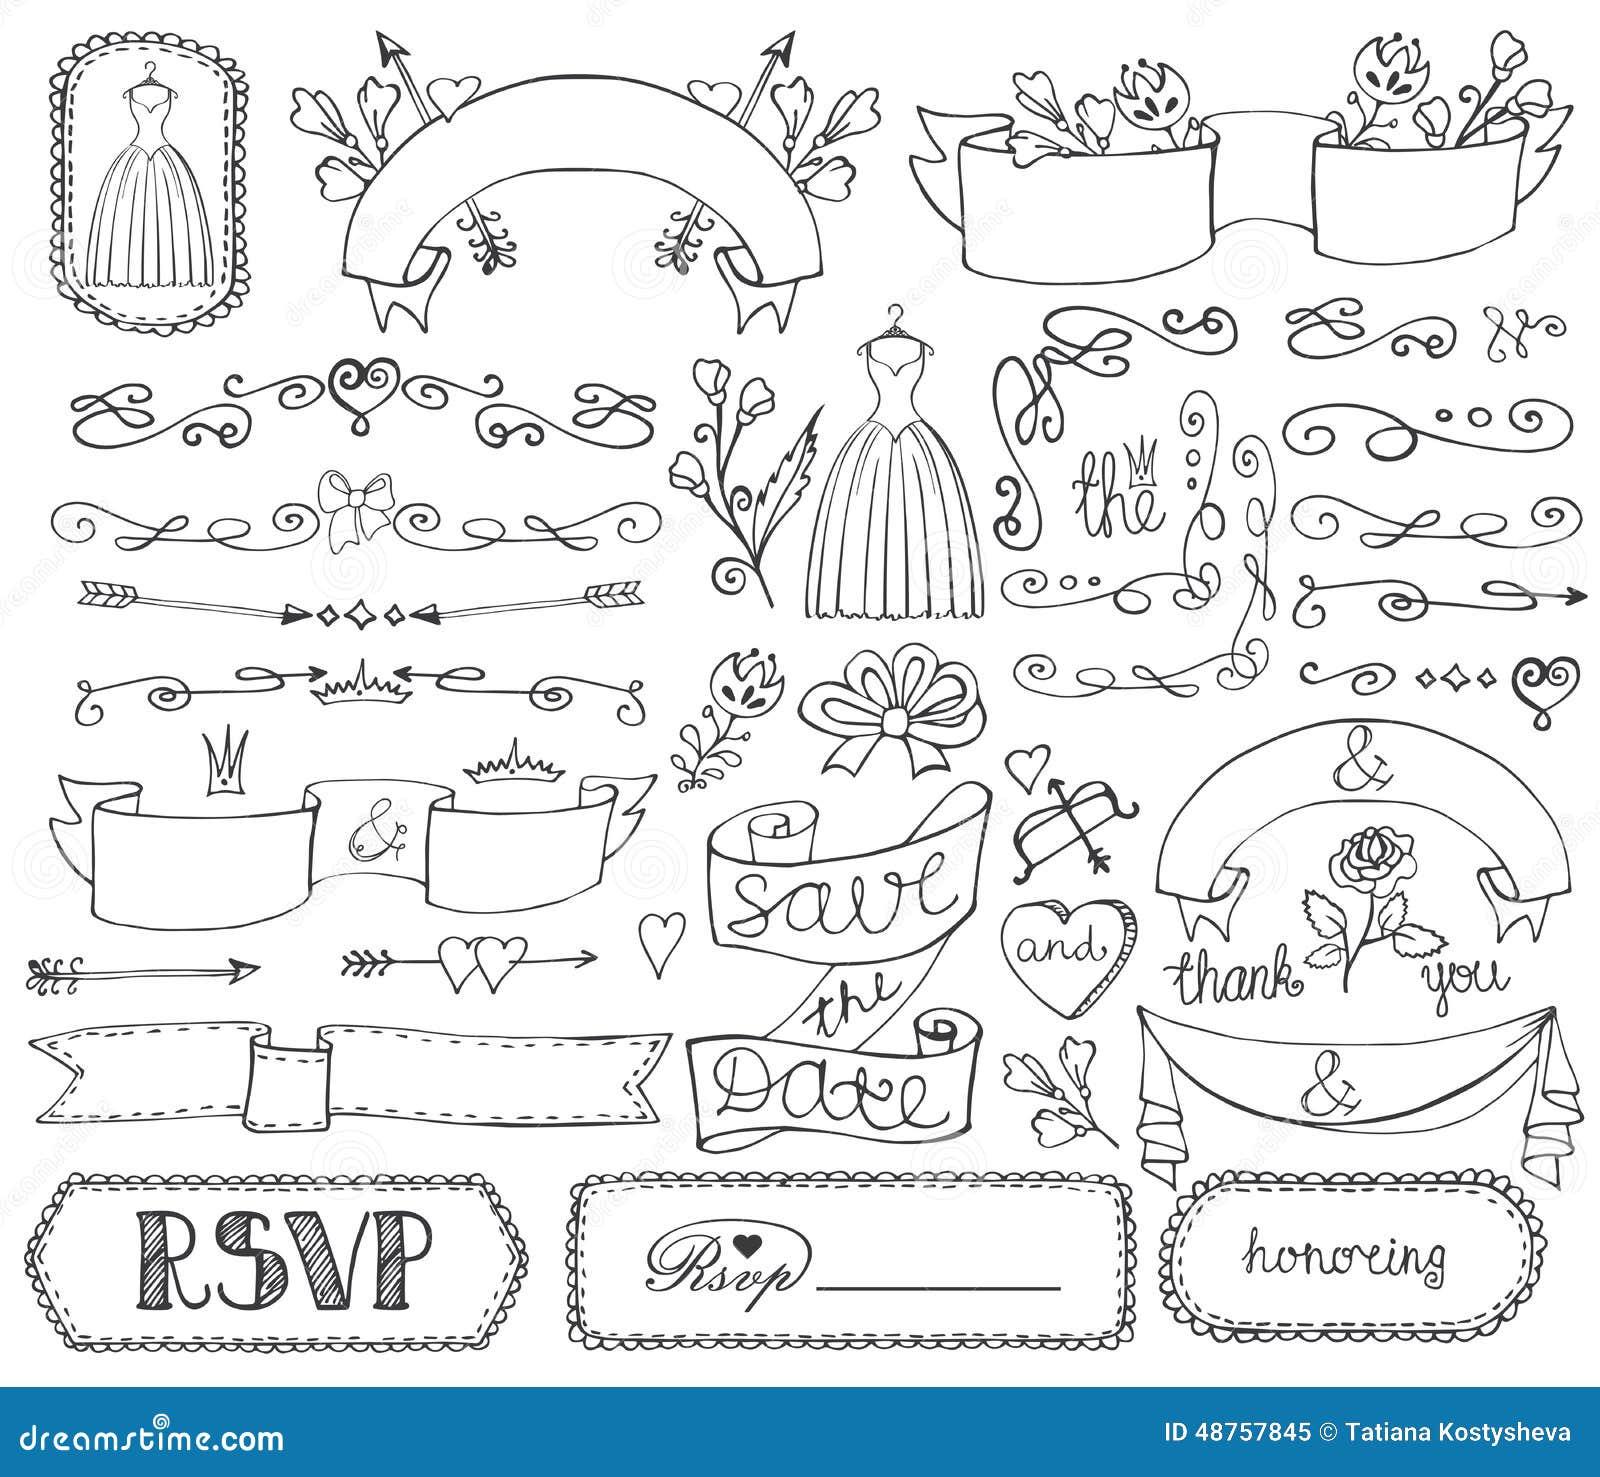 Decorative Wedding Invitation Badge 7: Doodle Bridal Shower Ribbons,border,badges,decor Stock